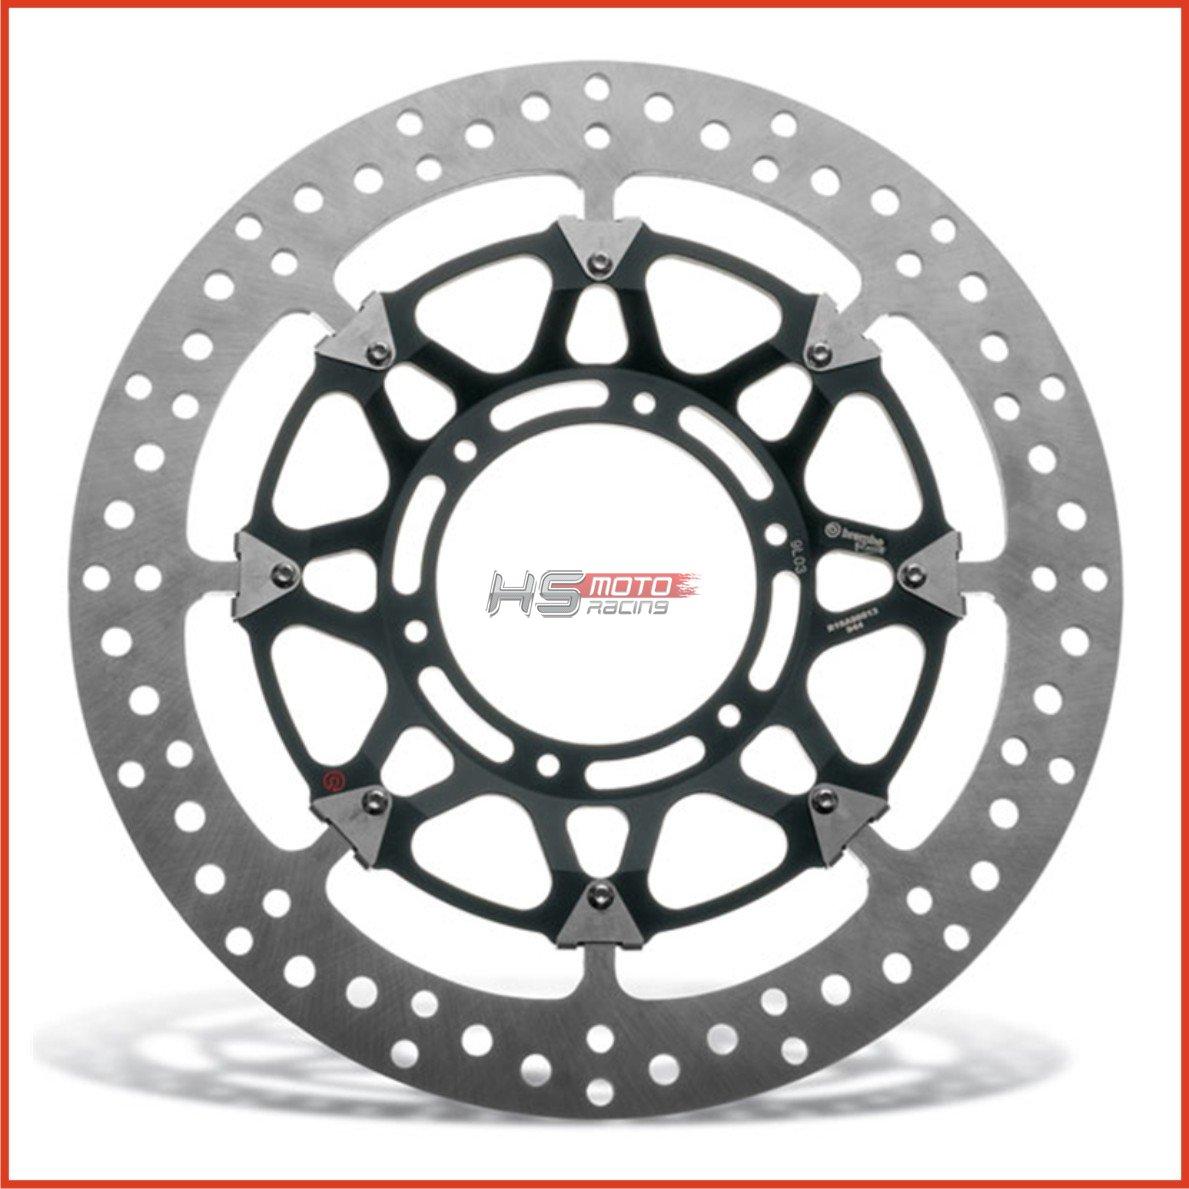 brembo brake discs set t drive yamaha yzf r1 04 06 Yzf R6